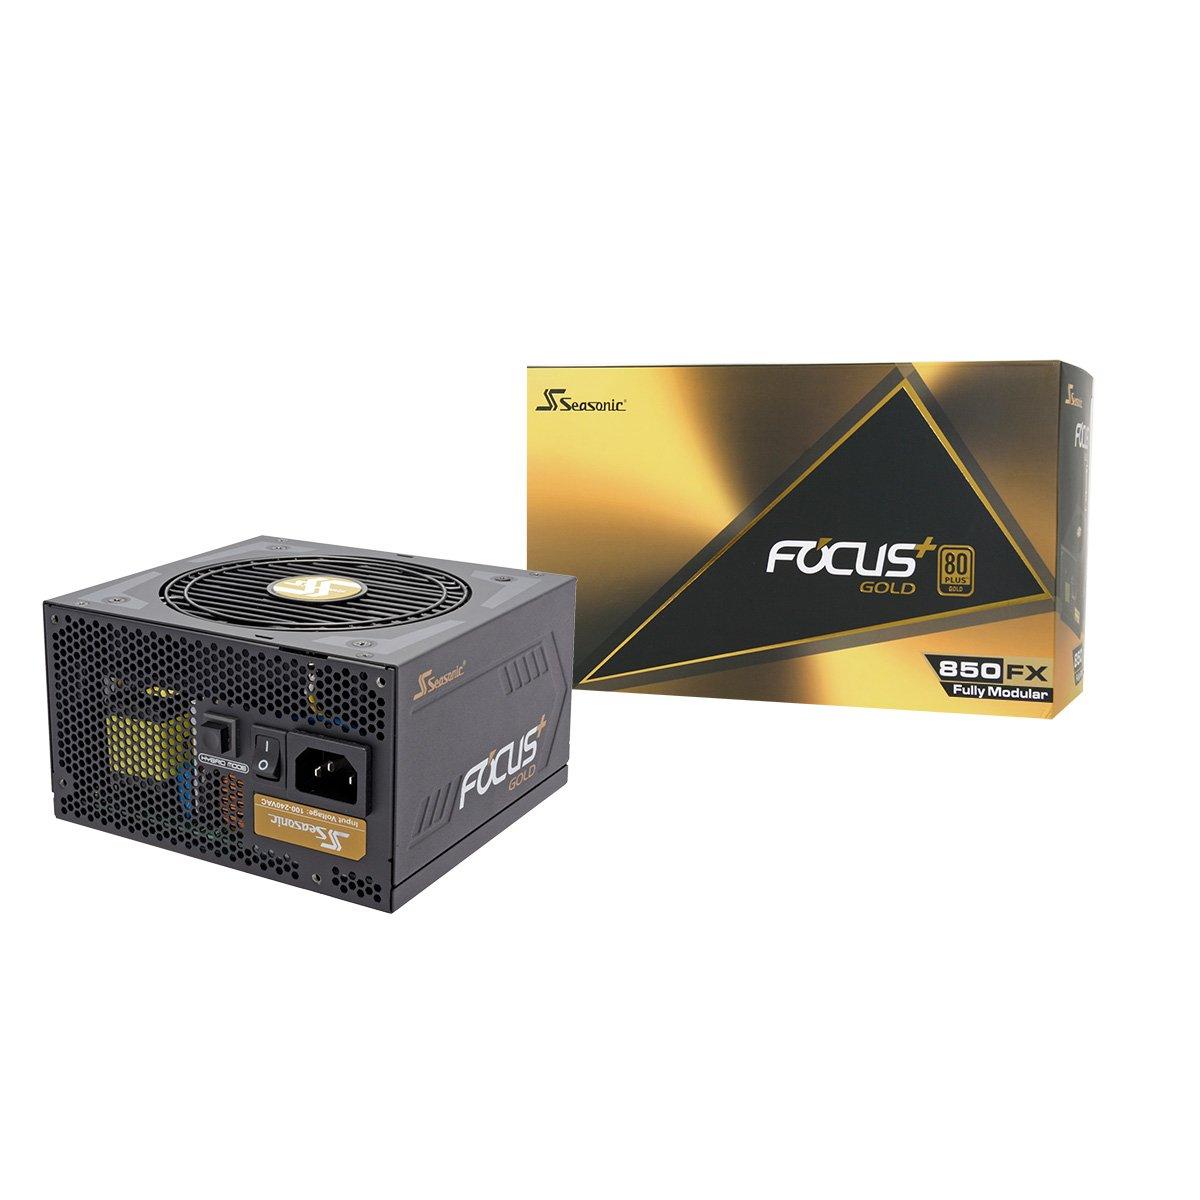 Seasonic FOCUS Plus Series SSR-850FX 850W 80+ Gold ATX12V & EPS12V Full Modular 120mm FDB Fan Compact 140 mm Size Power Supply by Seasonic